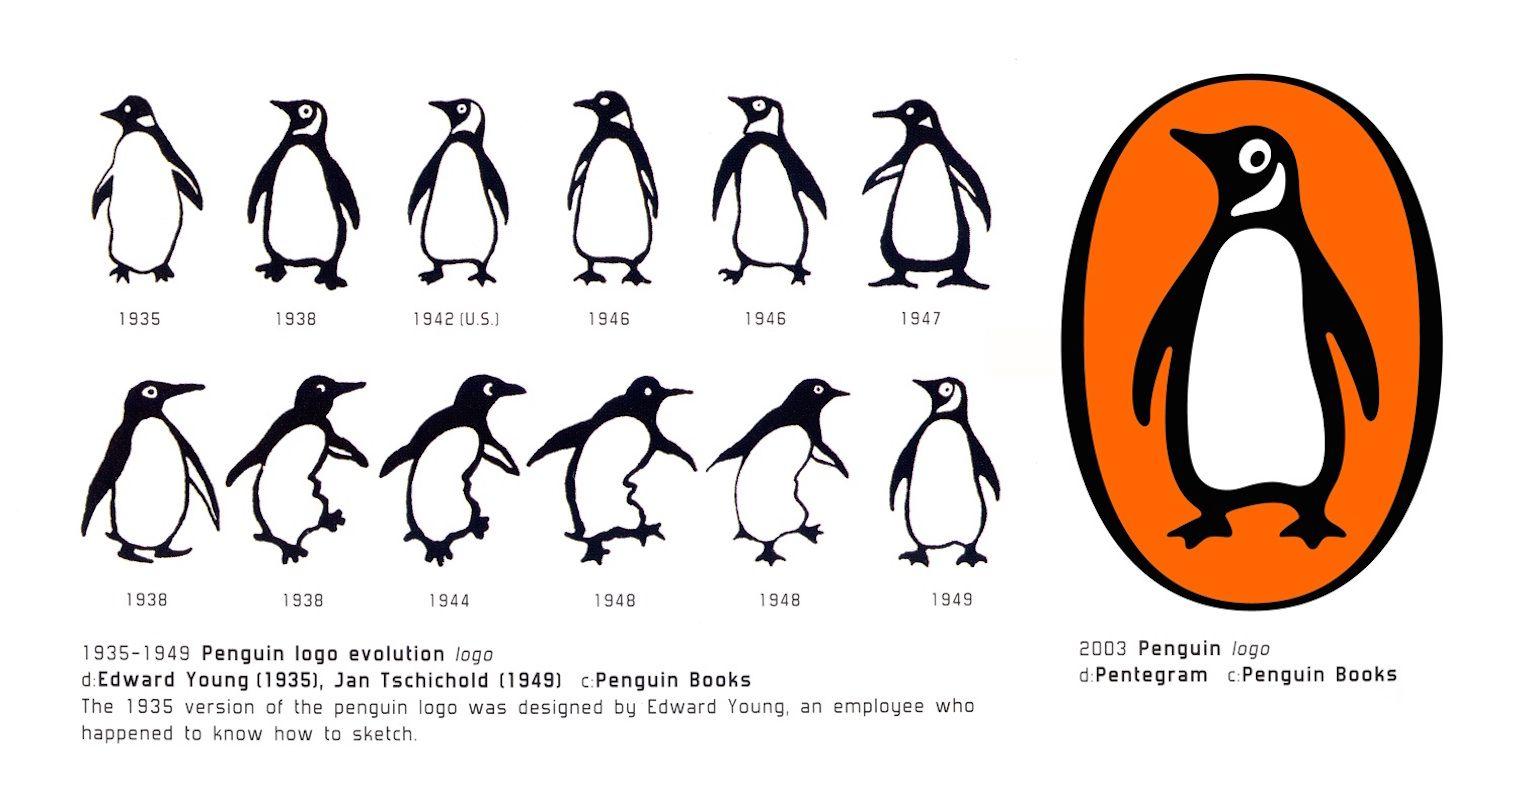 Pin By Ana Grajales On Brand Identity Pinterest Penguin Brand